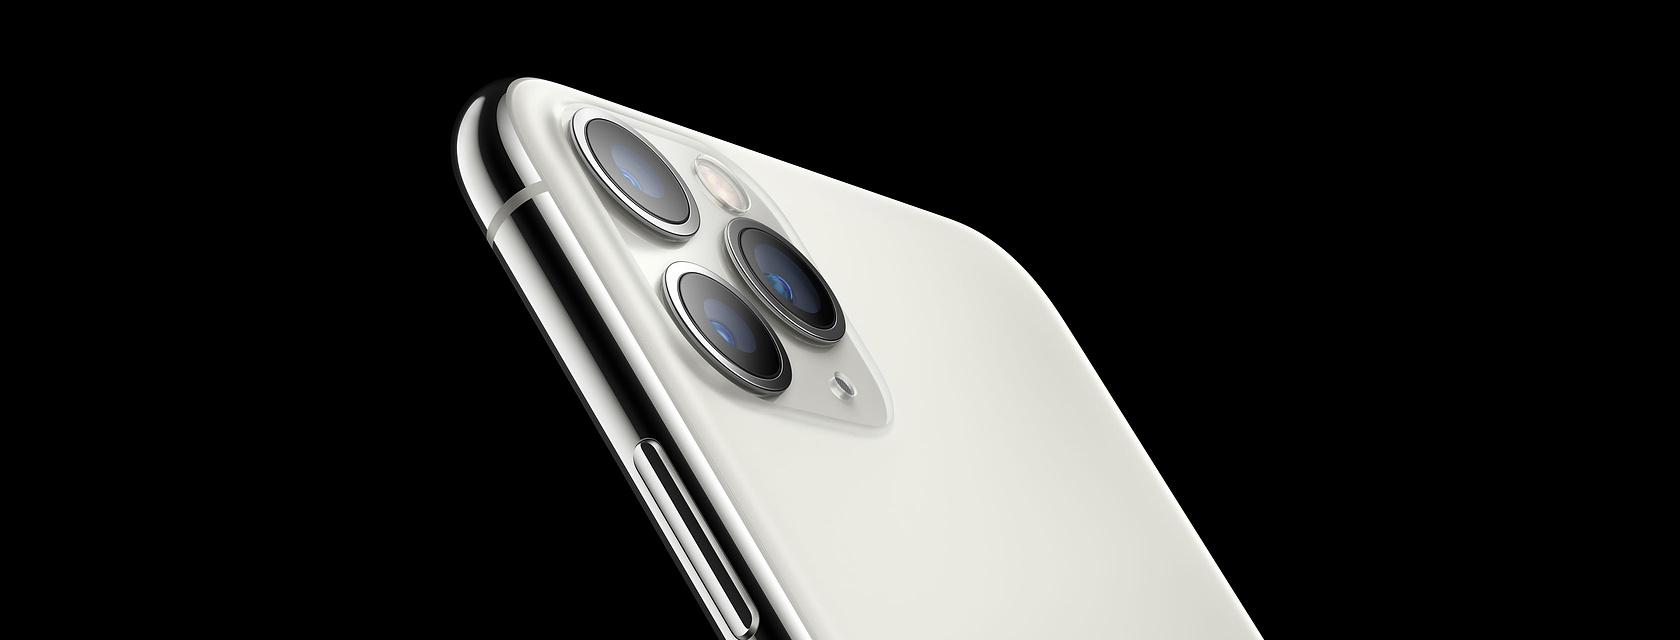 айфон 11 про макс 64 серебристый